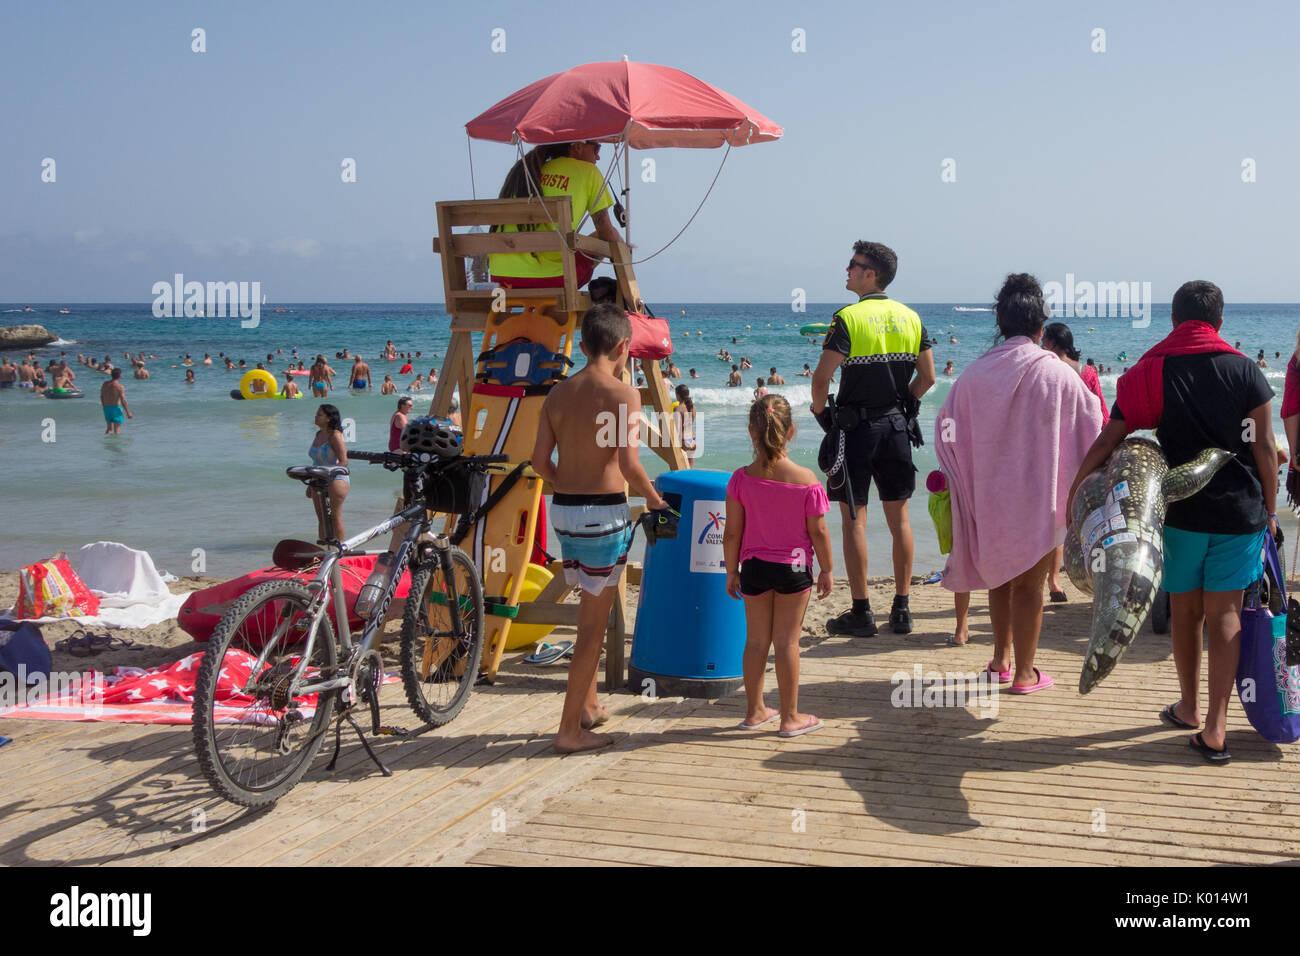 La playa local patrulla policial - policia local - Moraira beach Imagen De Stock